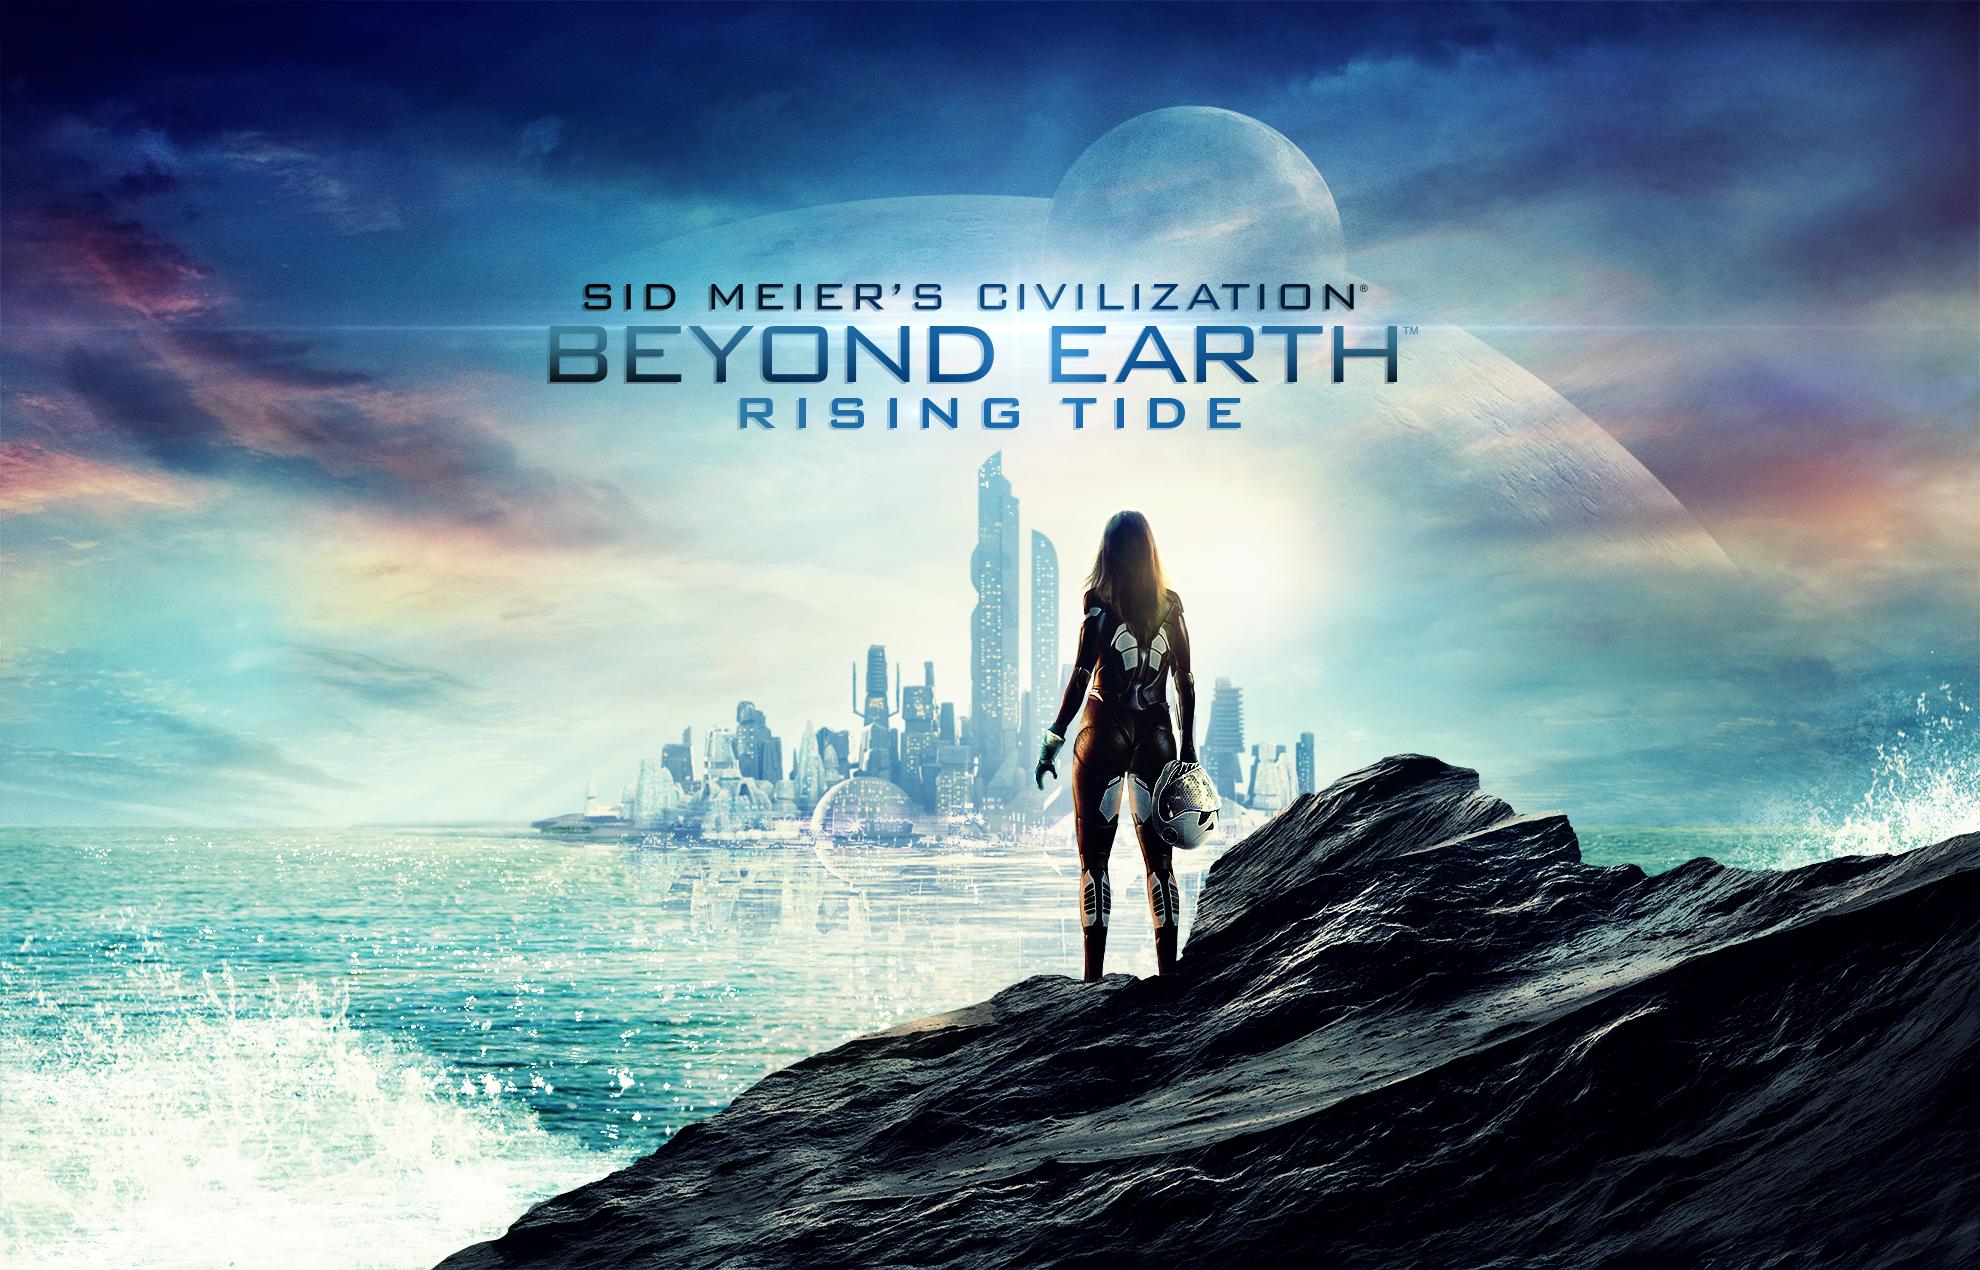 Davehinkle/2K Announces Sid Meier's Civilization: Beyond Earth - Rising Tide Expansion Pack